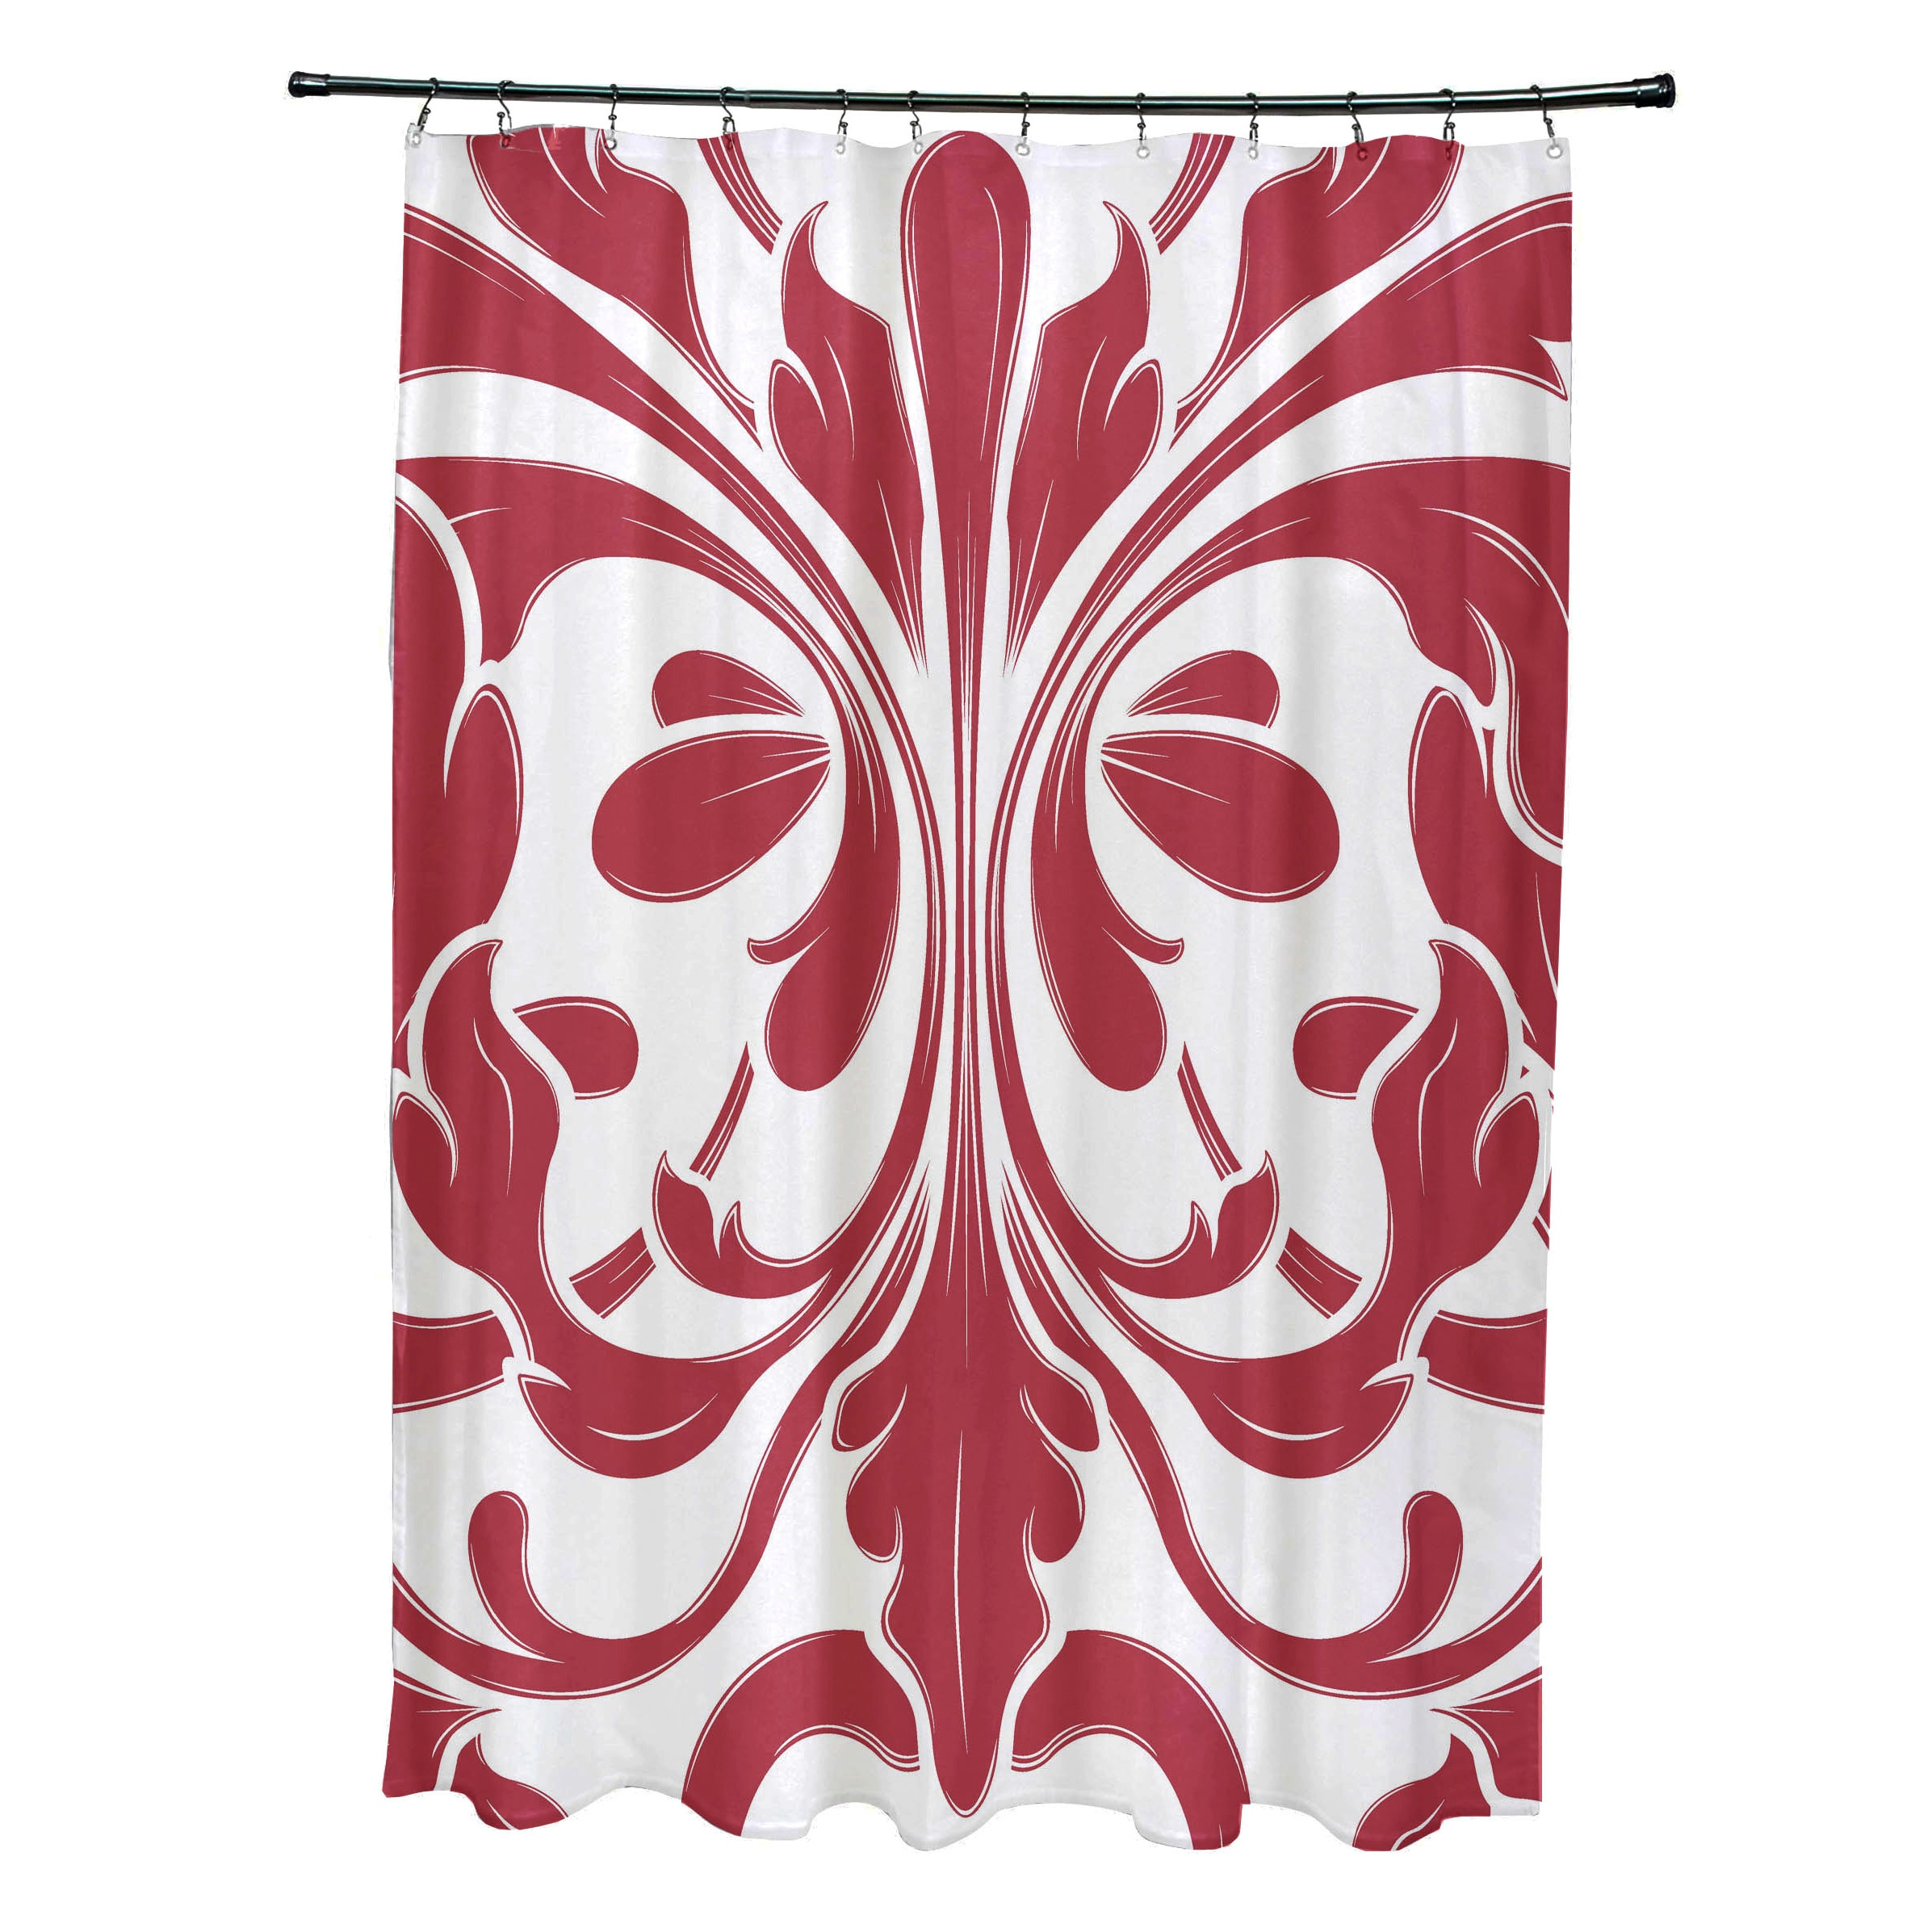 Shop British Colonial Geometric Print Shower Curtain